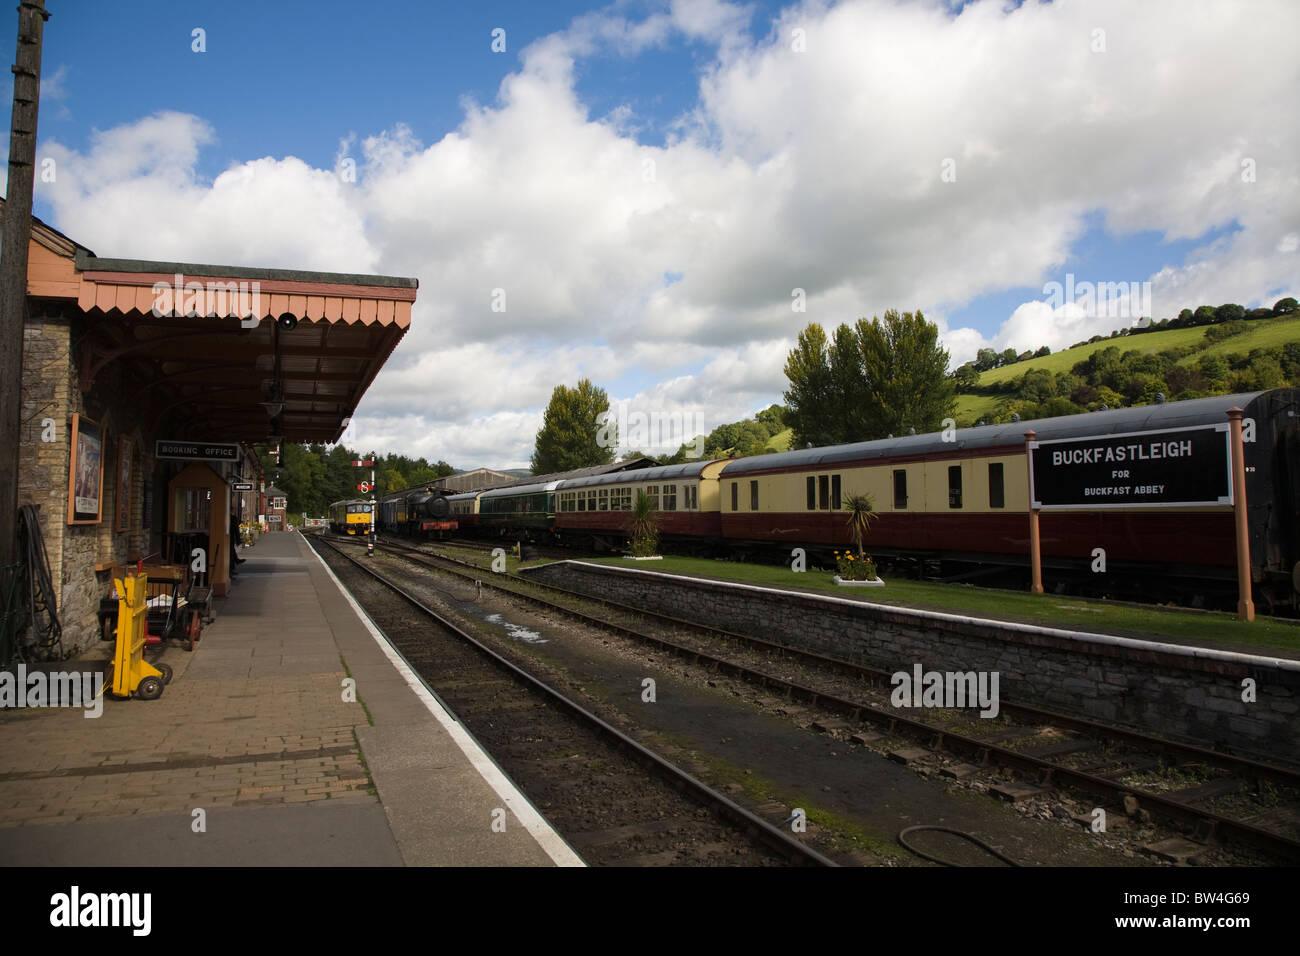 Buckfastleigh Station - Stock Image